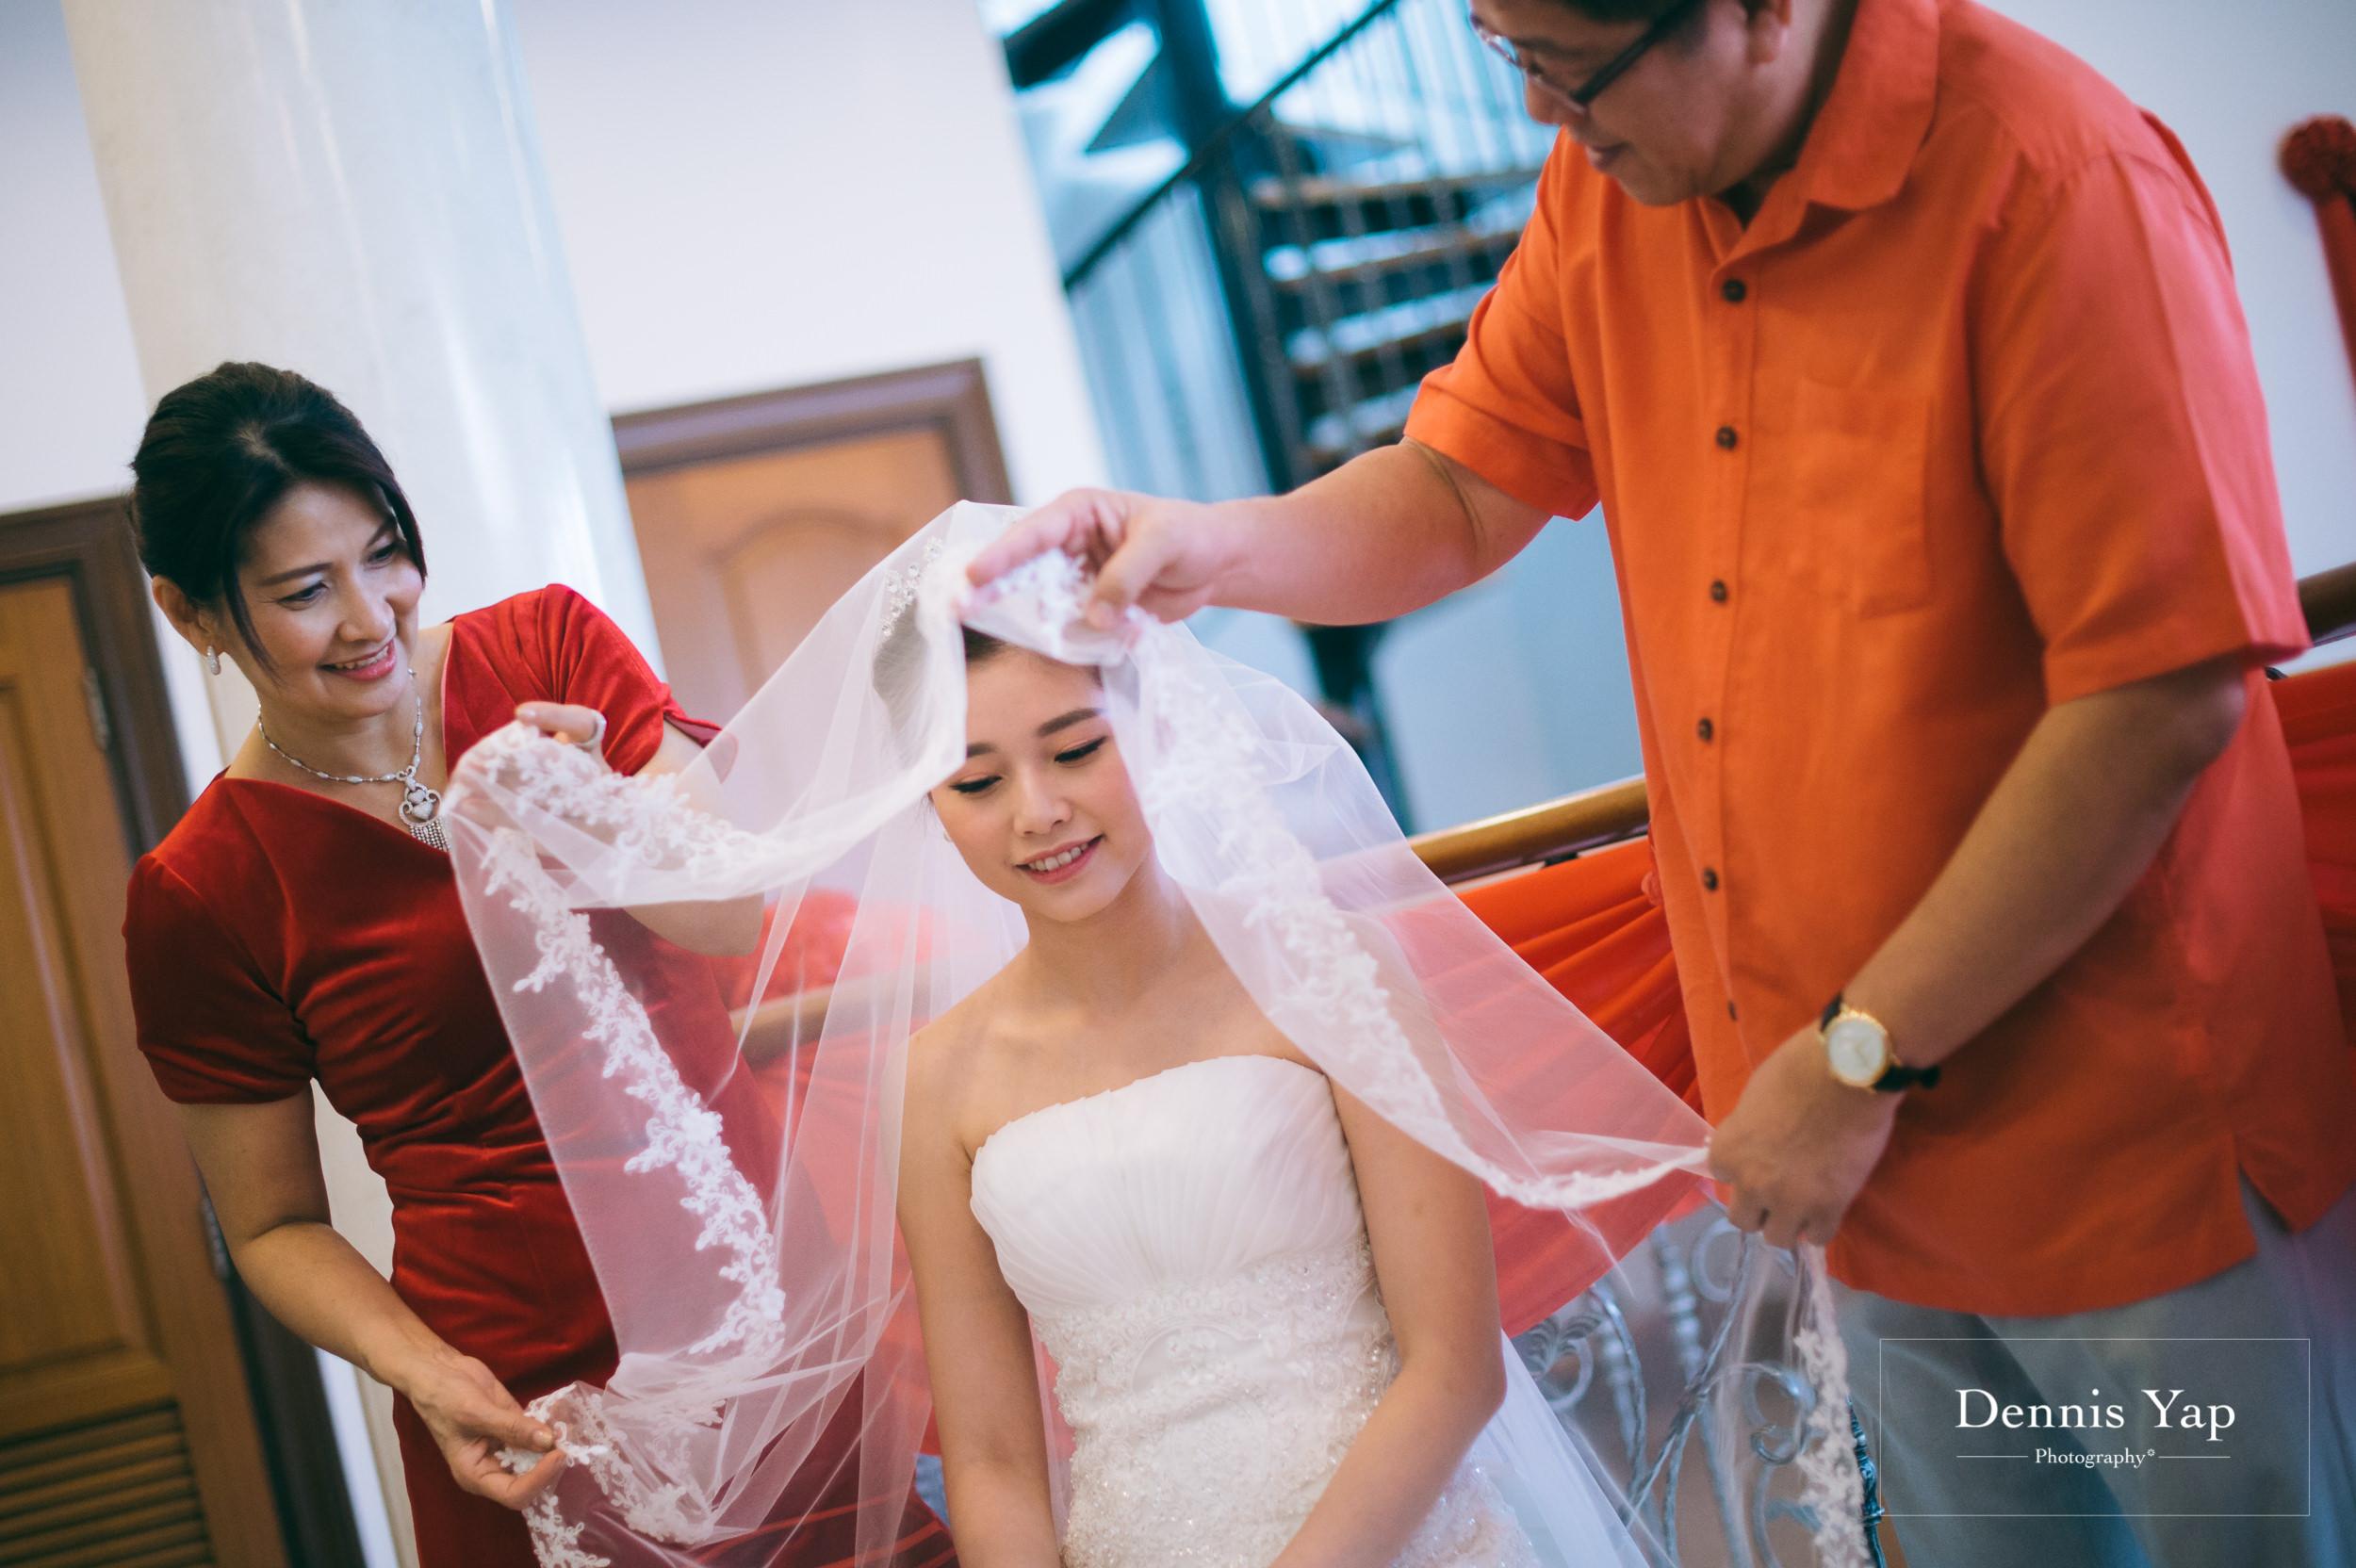 ivan constance wedding day renaissance hotel dennis yap photography-12.jpg